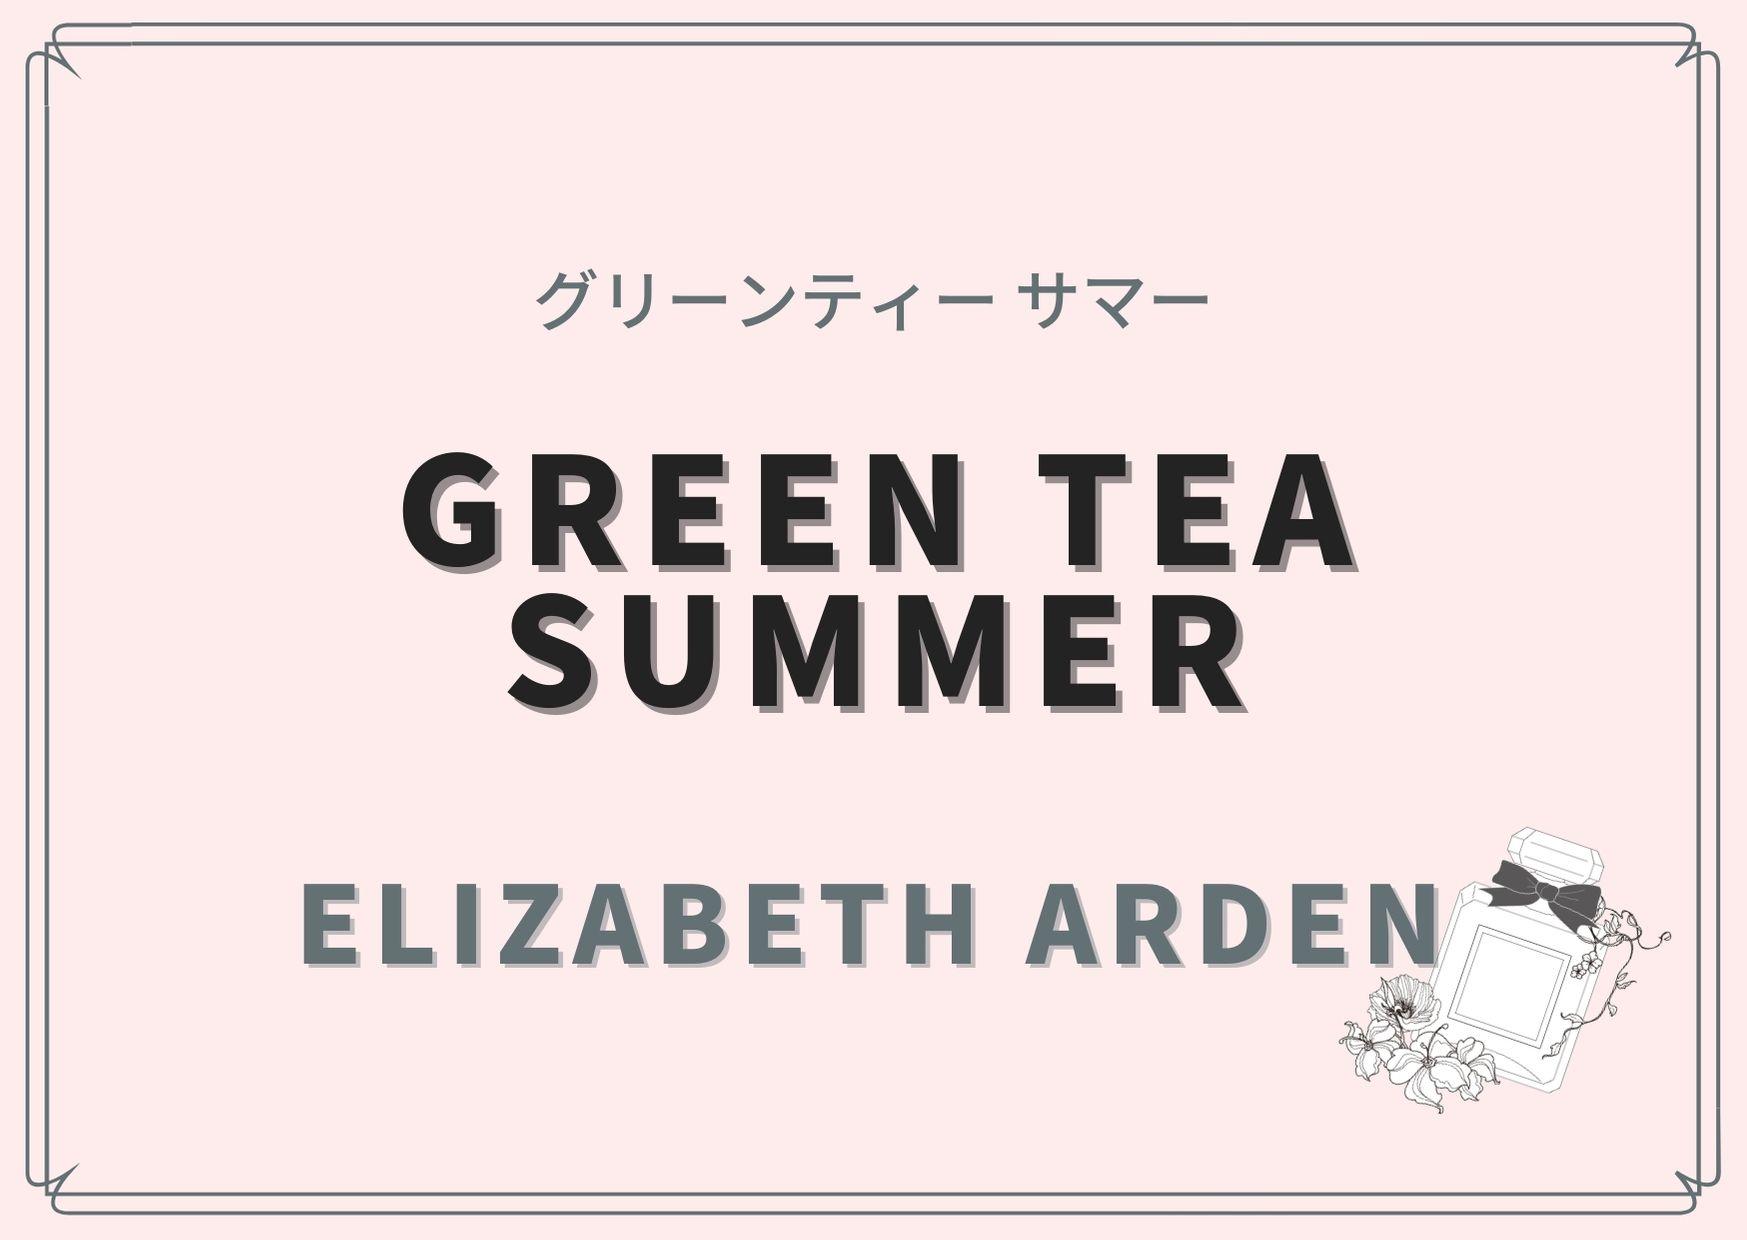 GREEN TEA SUMMER(グリーンティー サマー)/Elizabeth Arden(エリザベス アーデン)